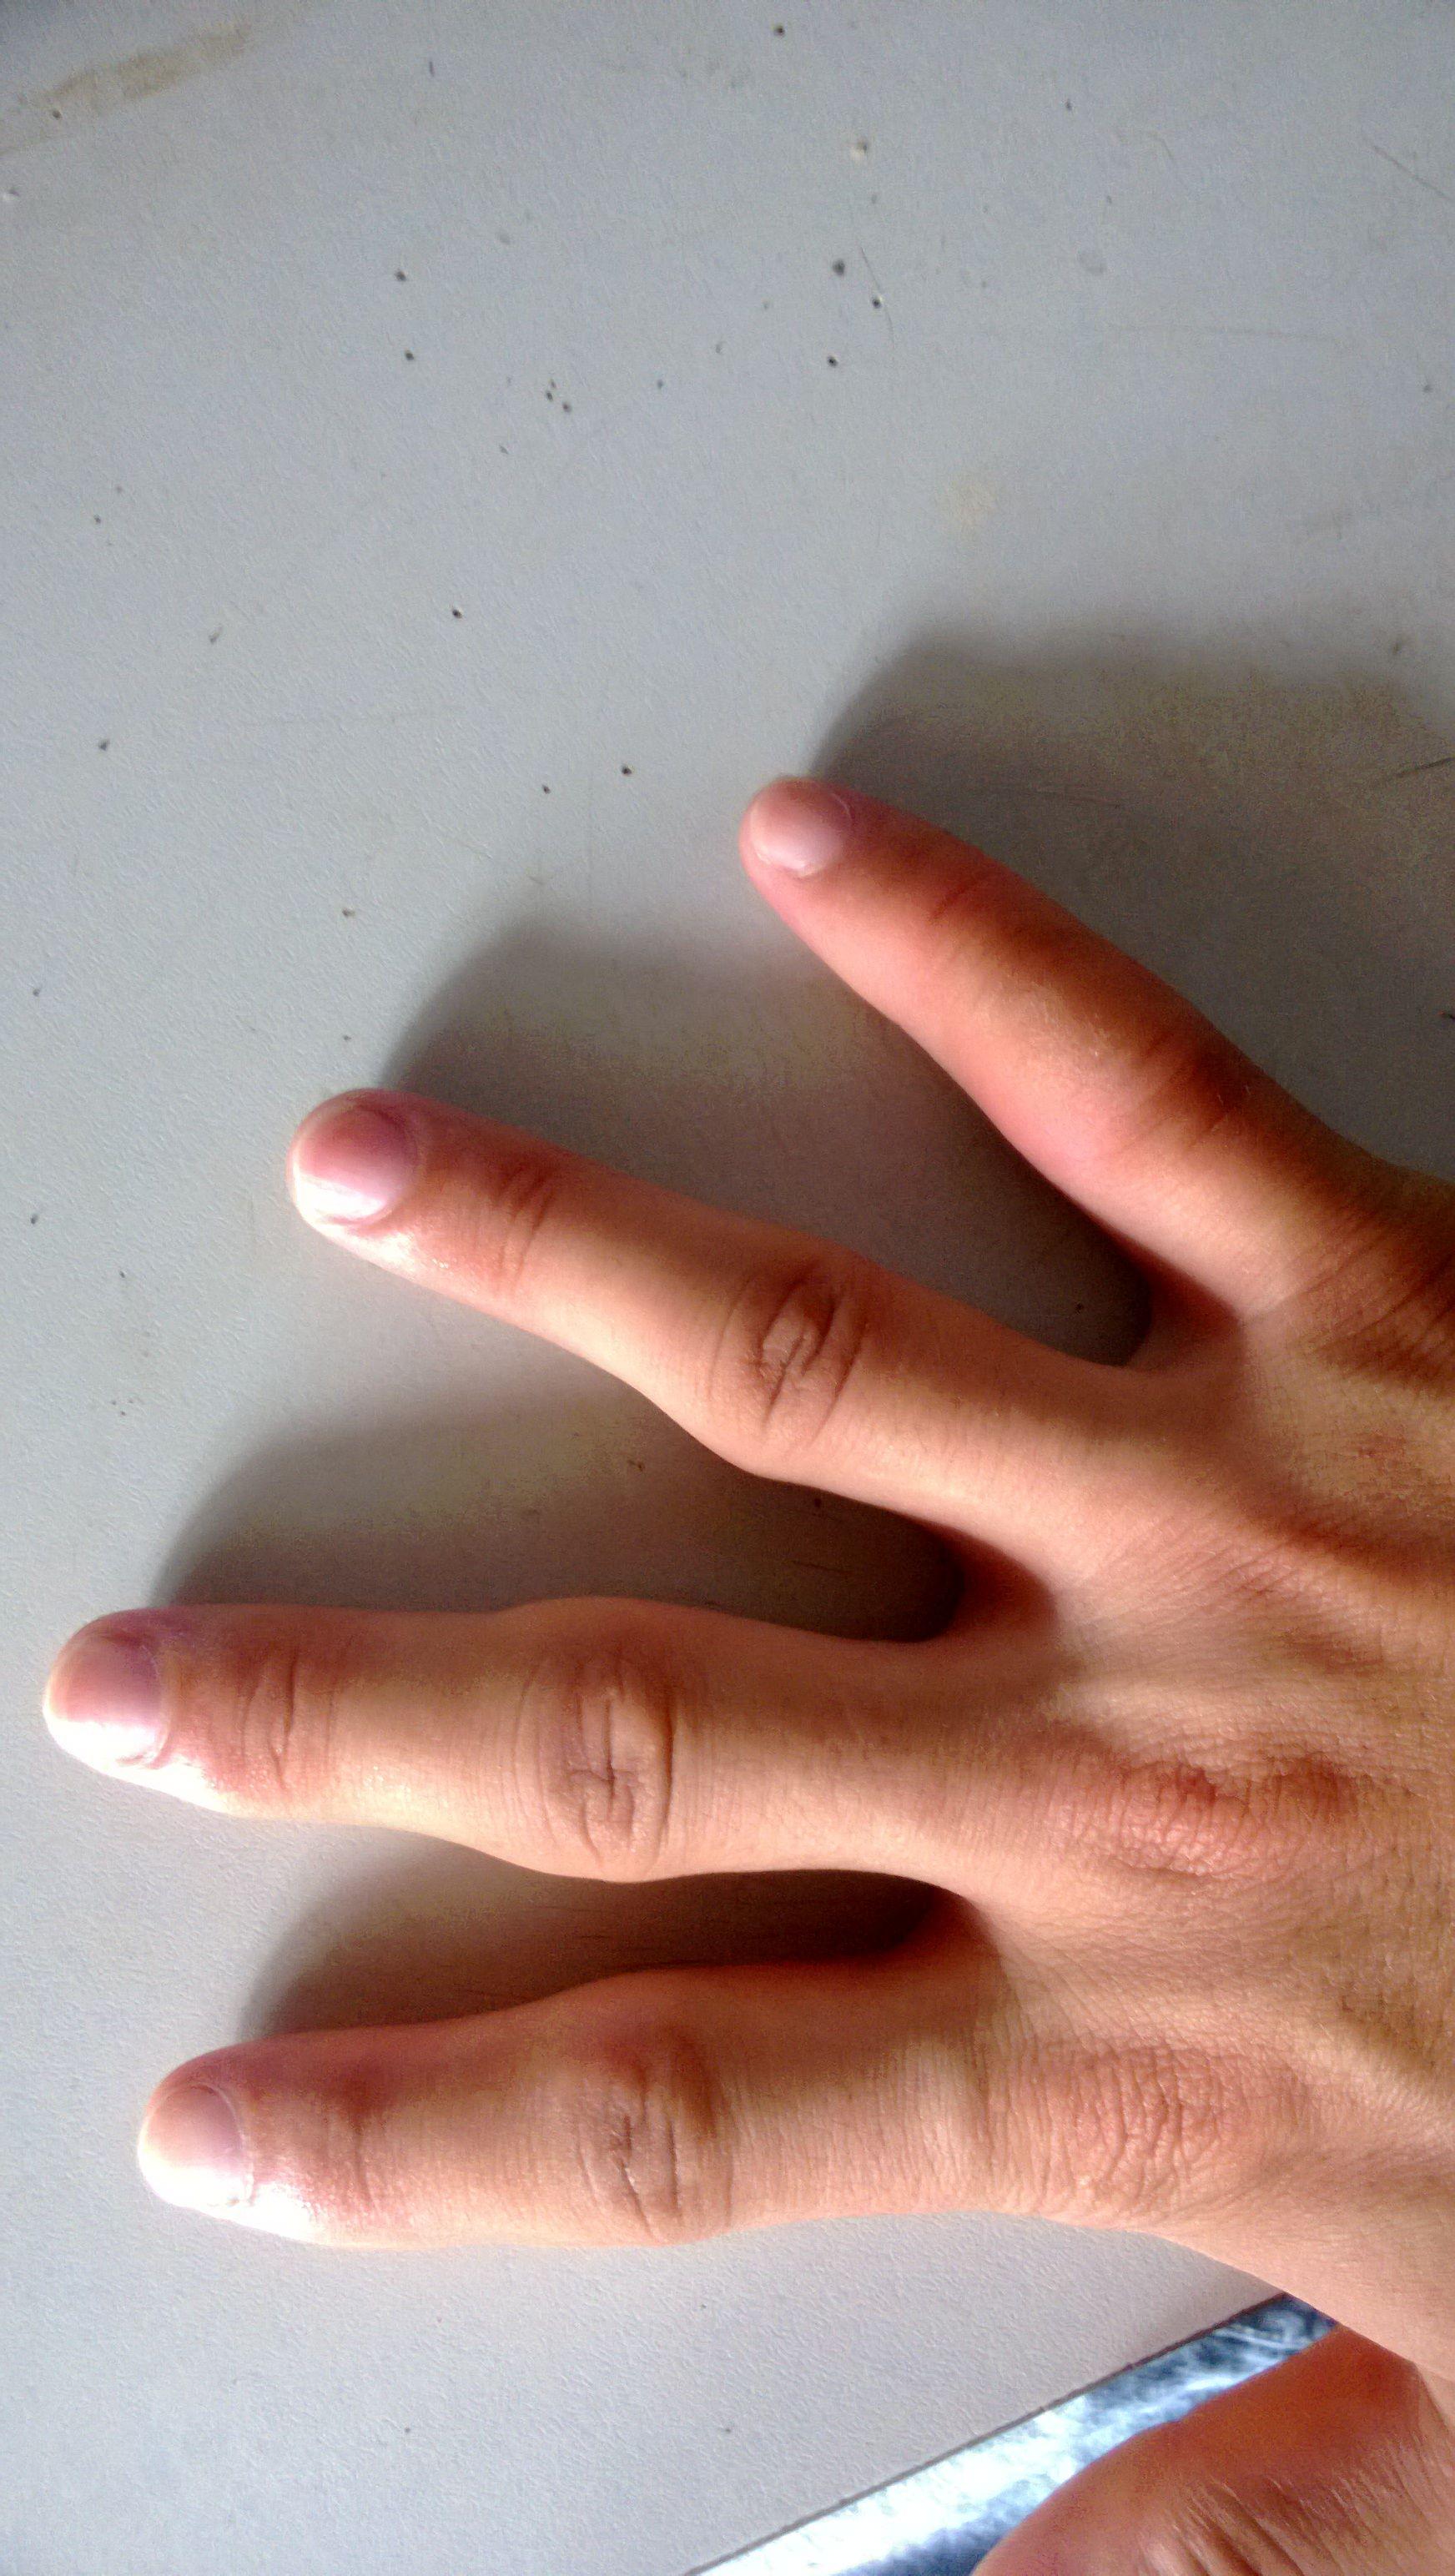 t的手指多长够用 测量手指尺寸